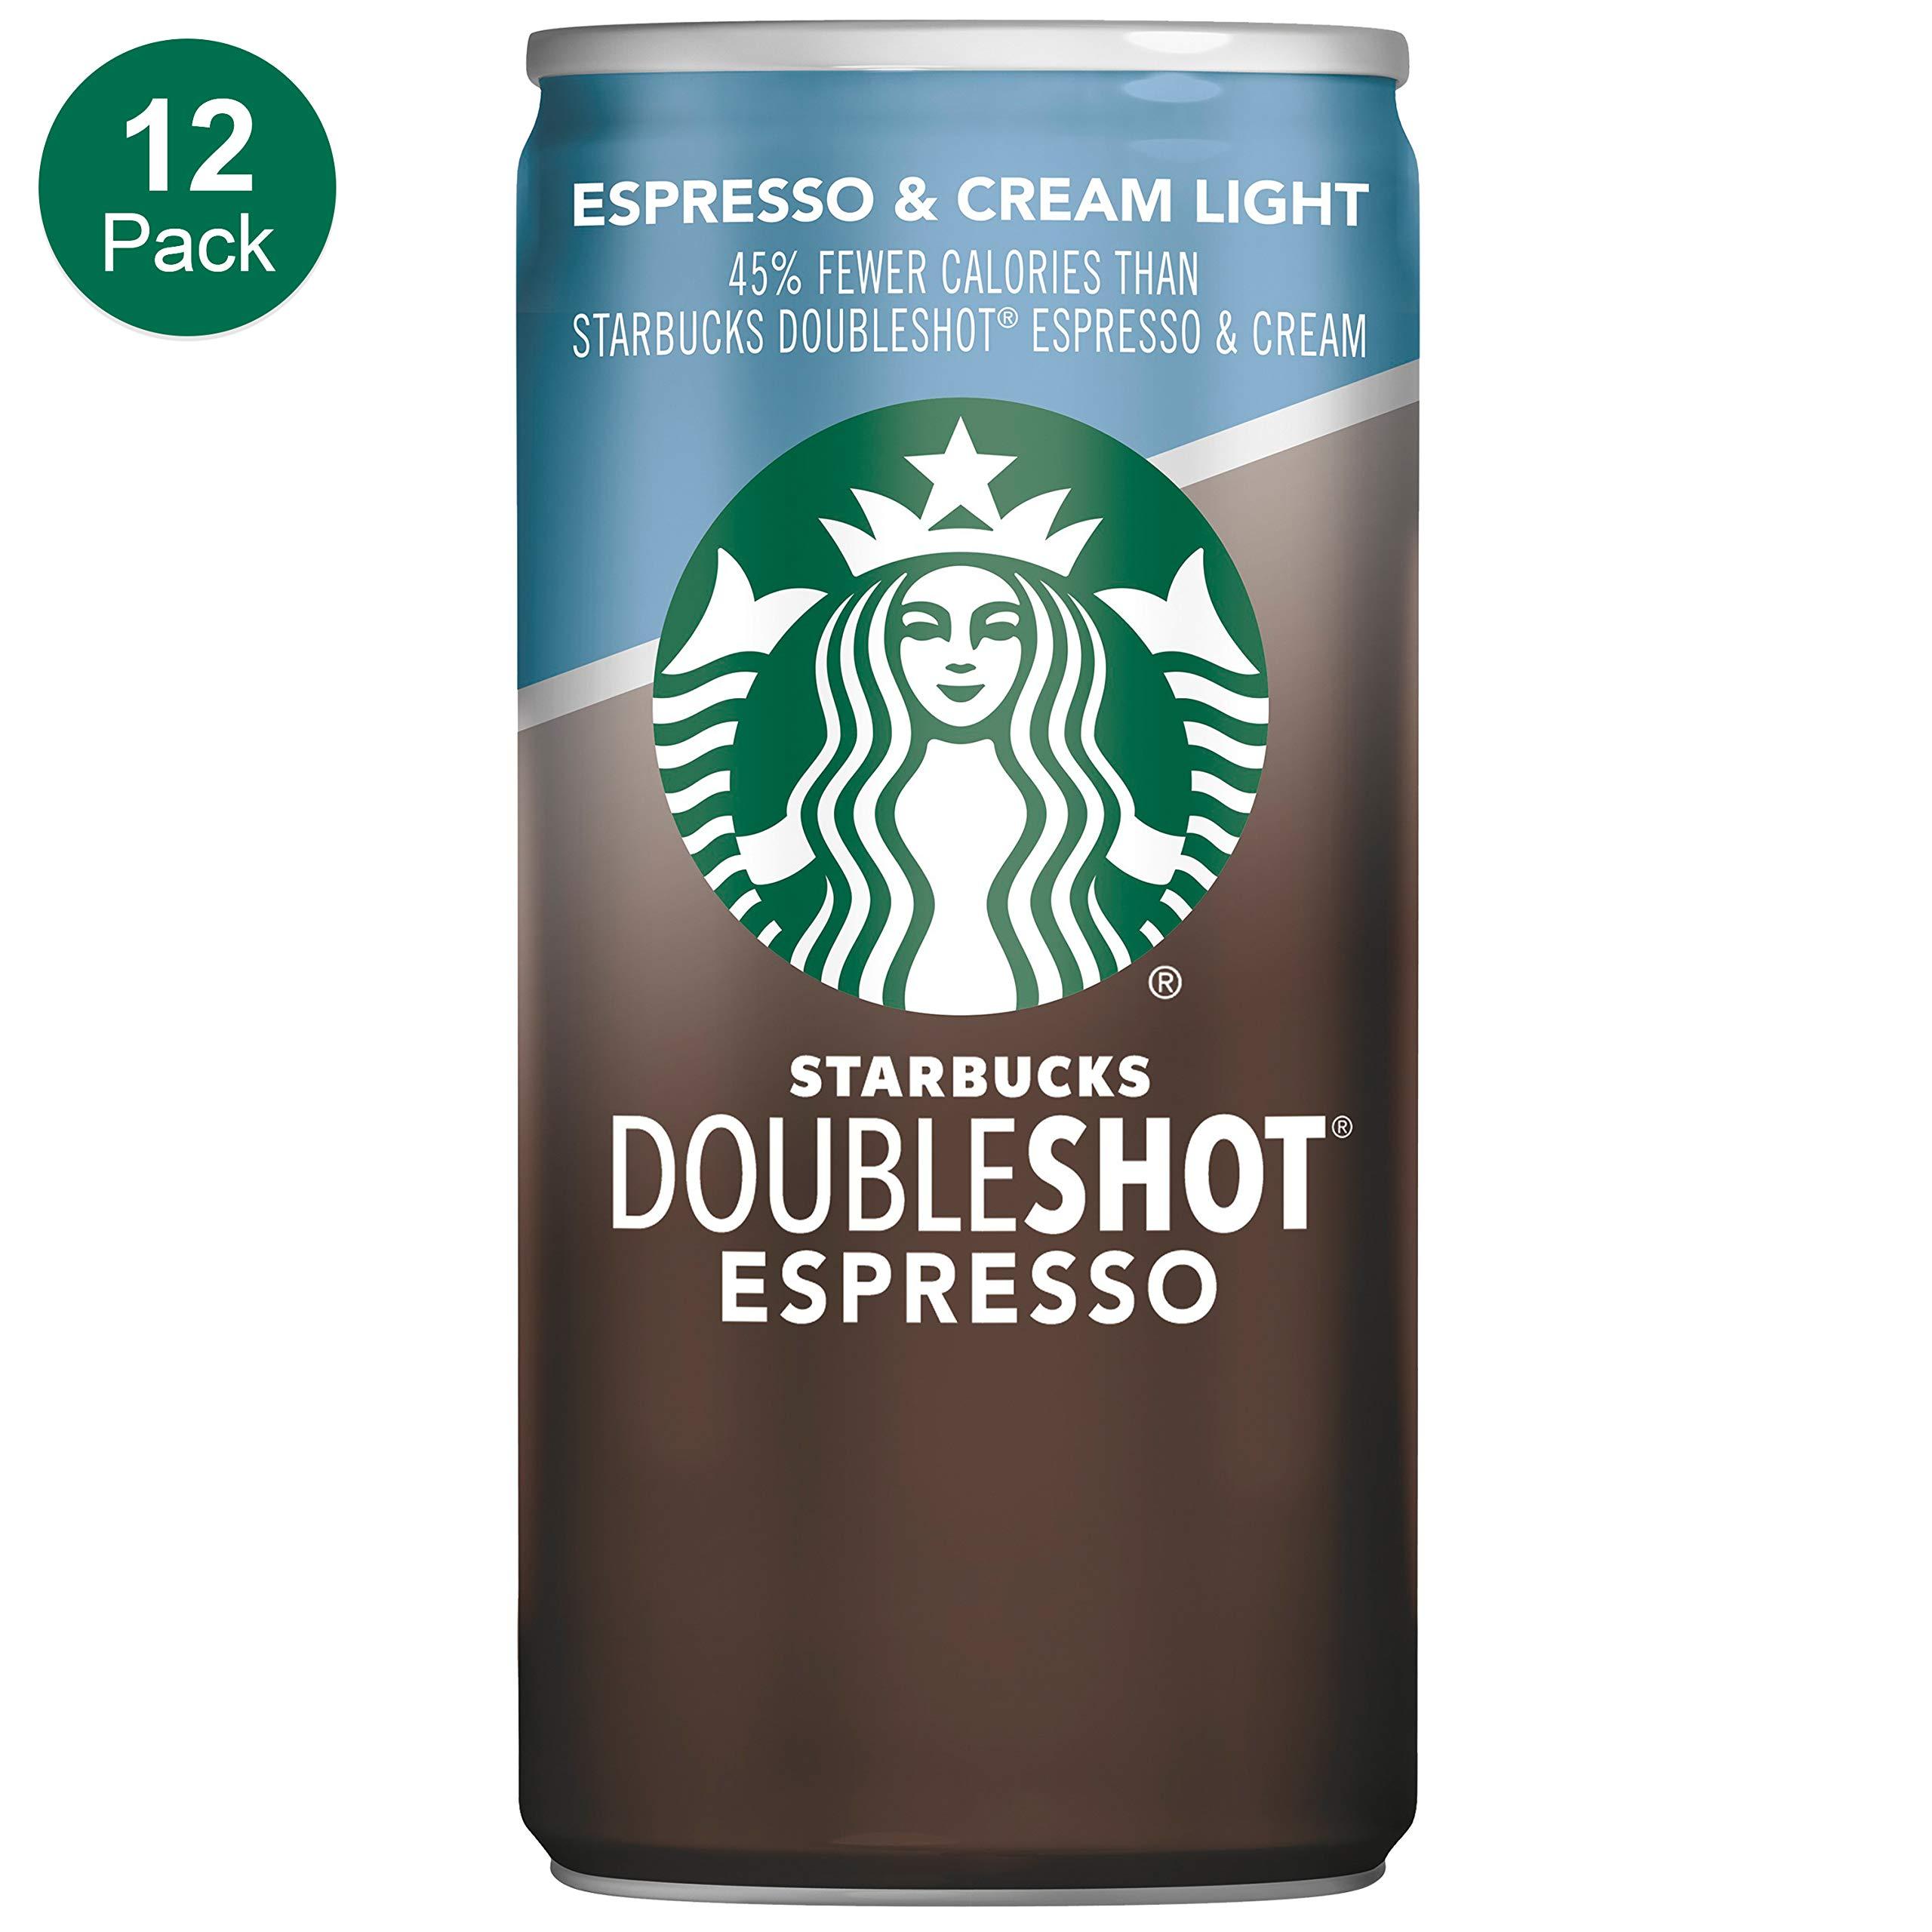 Starbucks Doubleshot, Espresso + Cream Light, 6.5 Ounce, 12 Pack by Starbucks